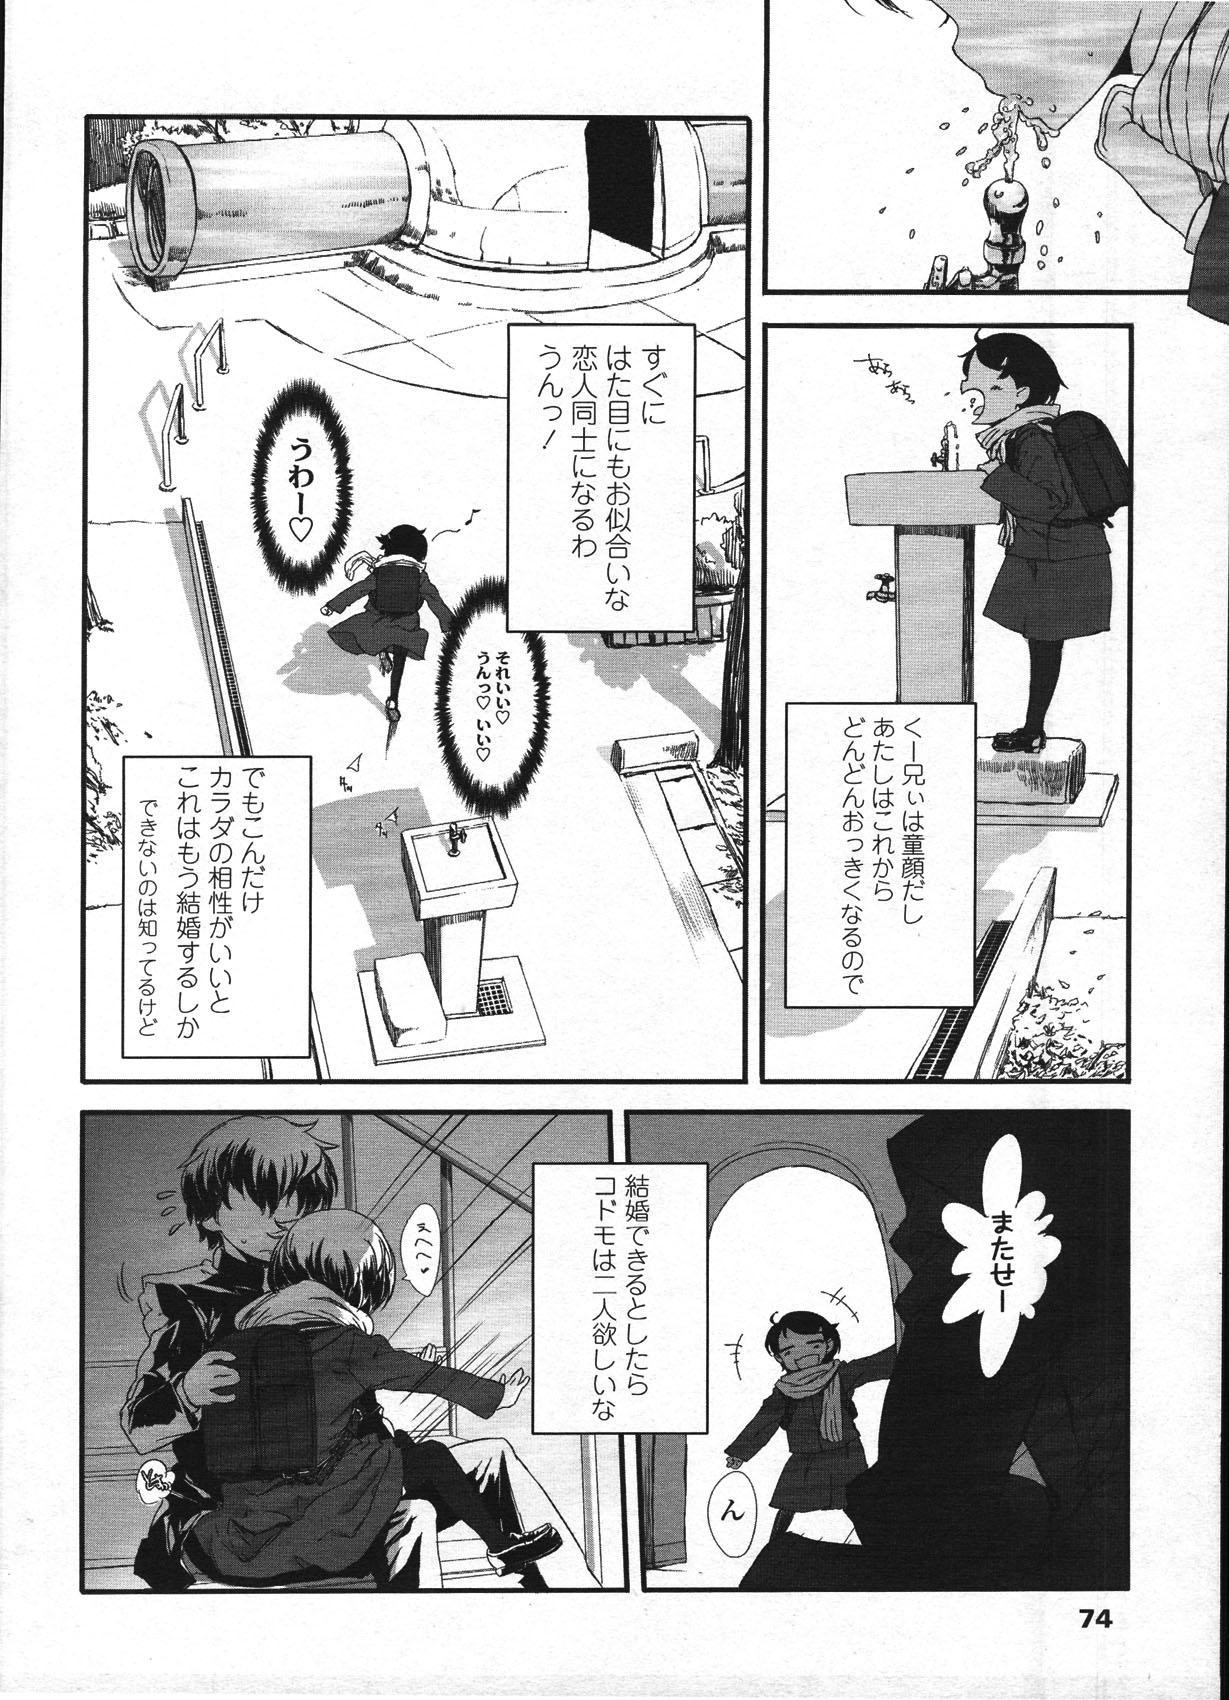 Comic LO 2009-04 Vol. 61 74